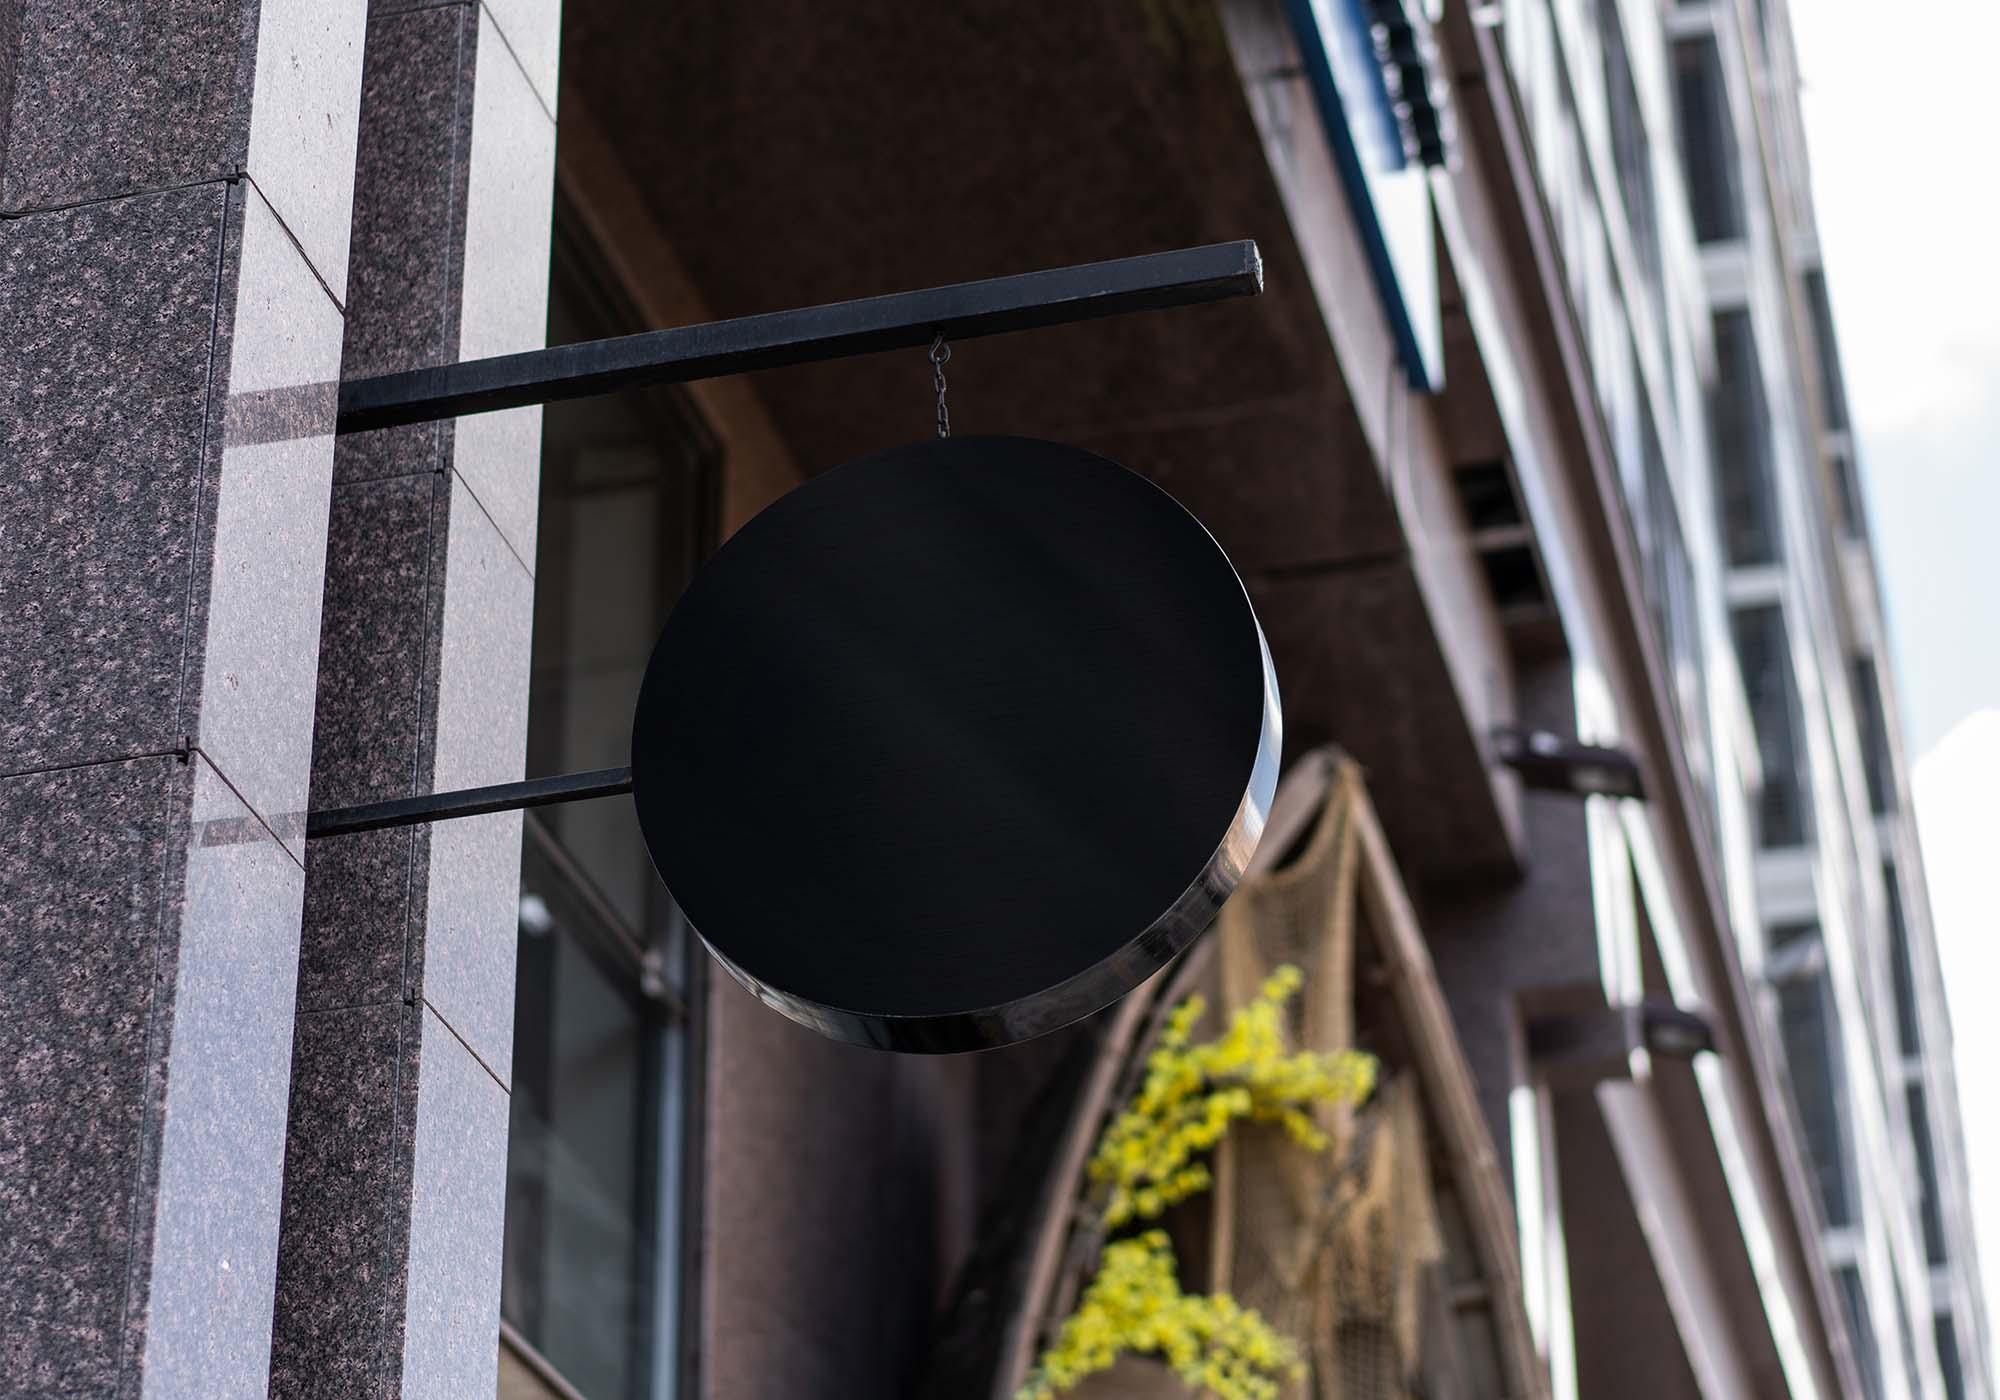 Hanging Round Wall Sign Mockup 2